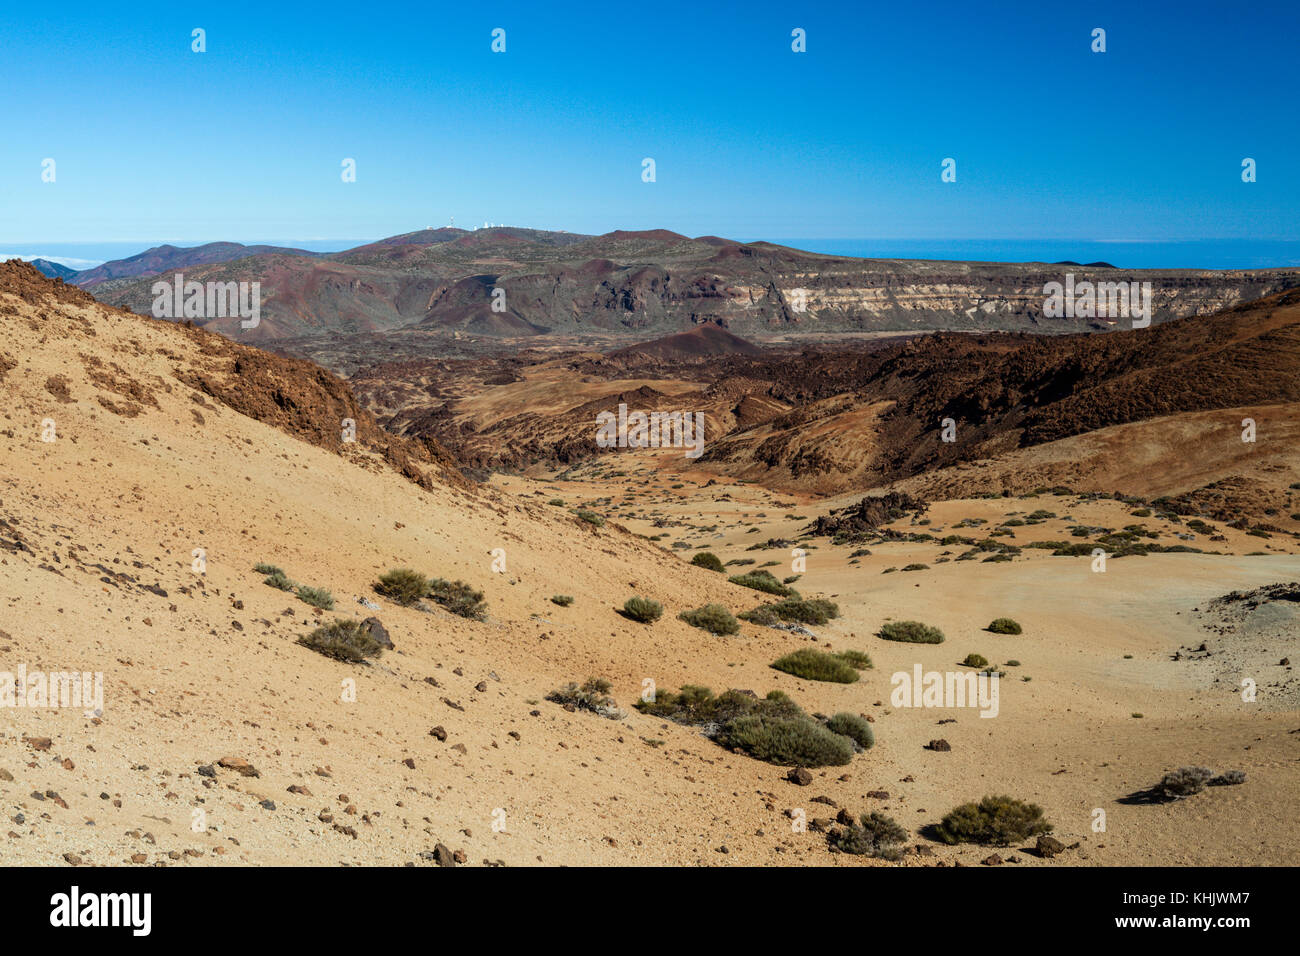 Im Nordosten von Teneriffa aus Montana Blanca, Teneriffa, Spanien Stockbild